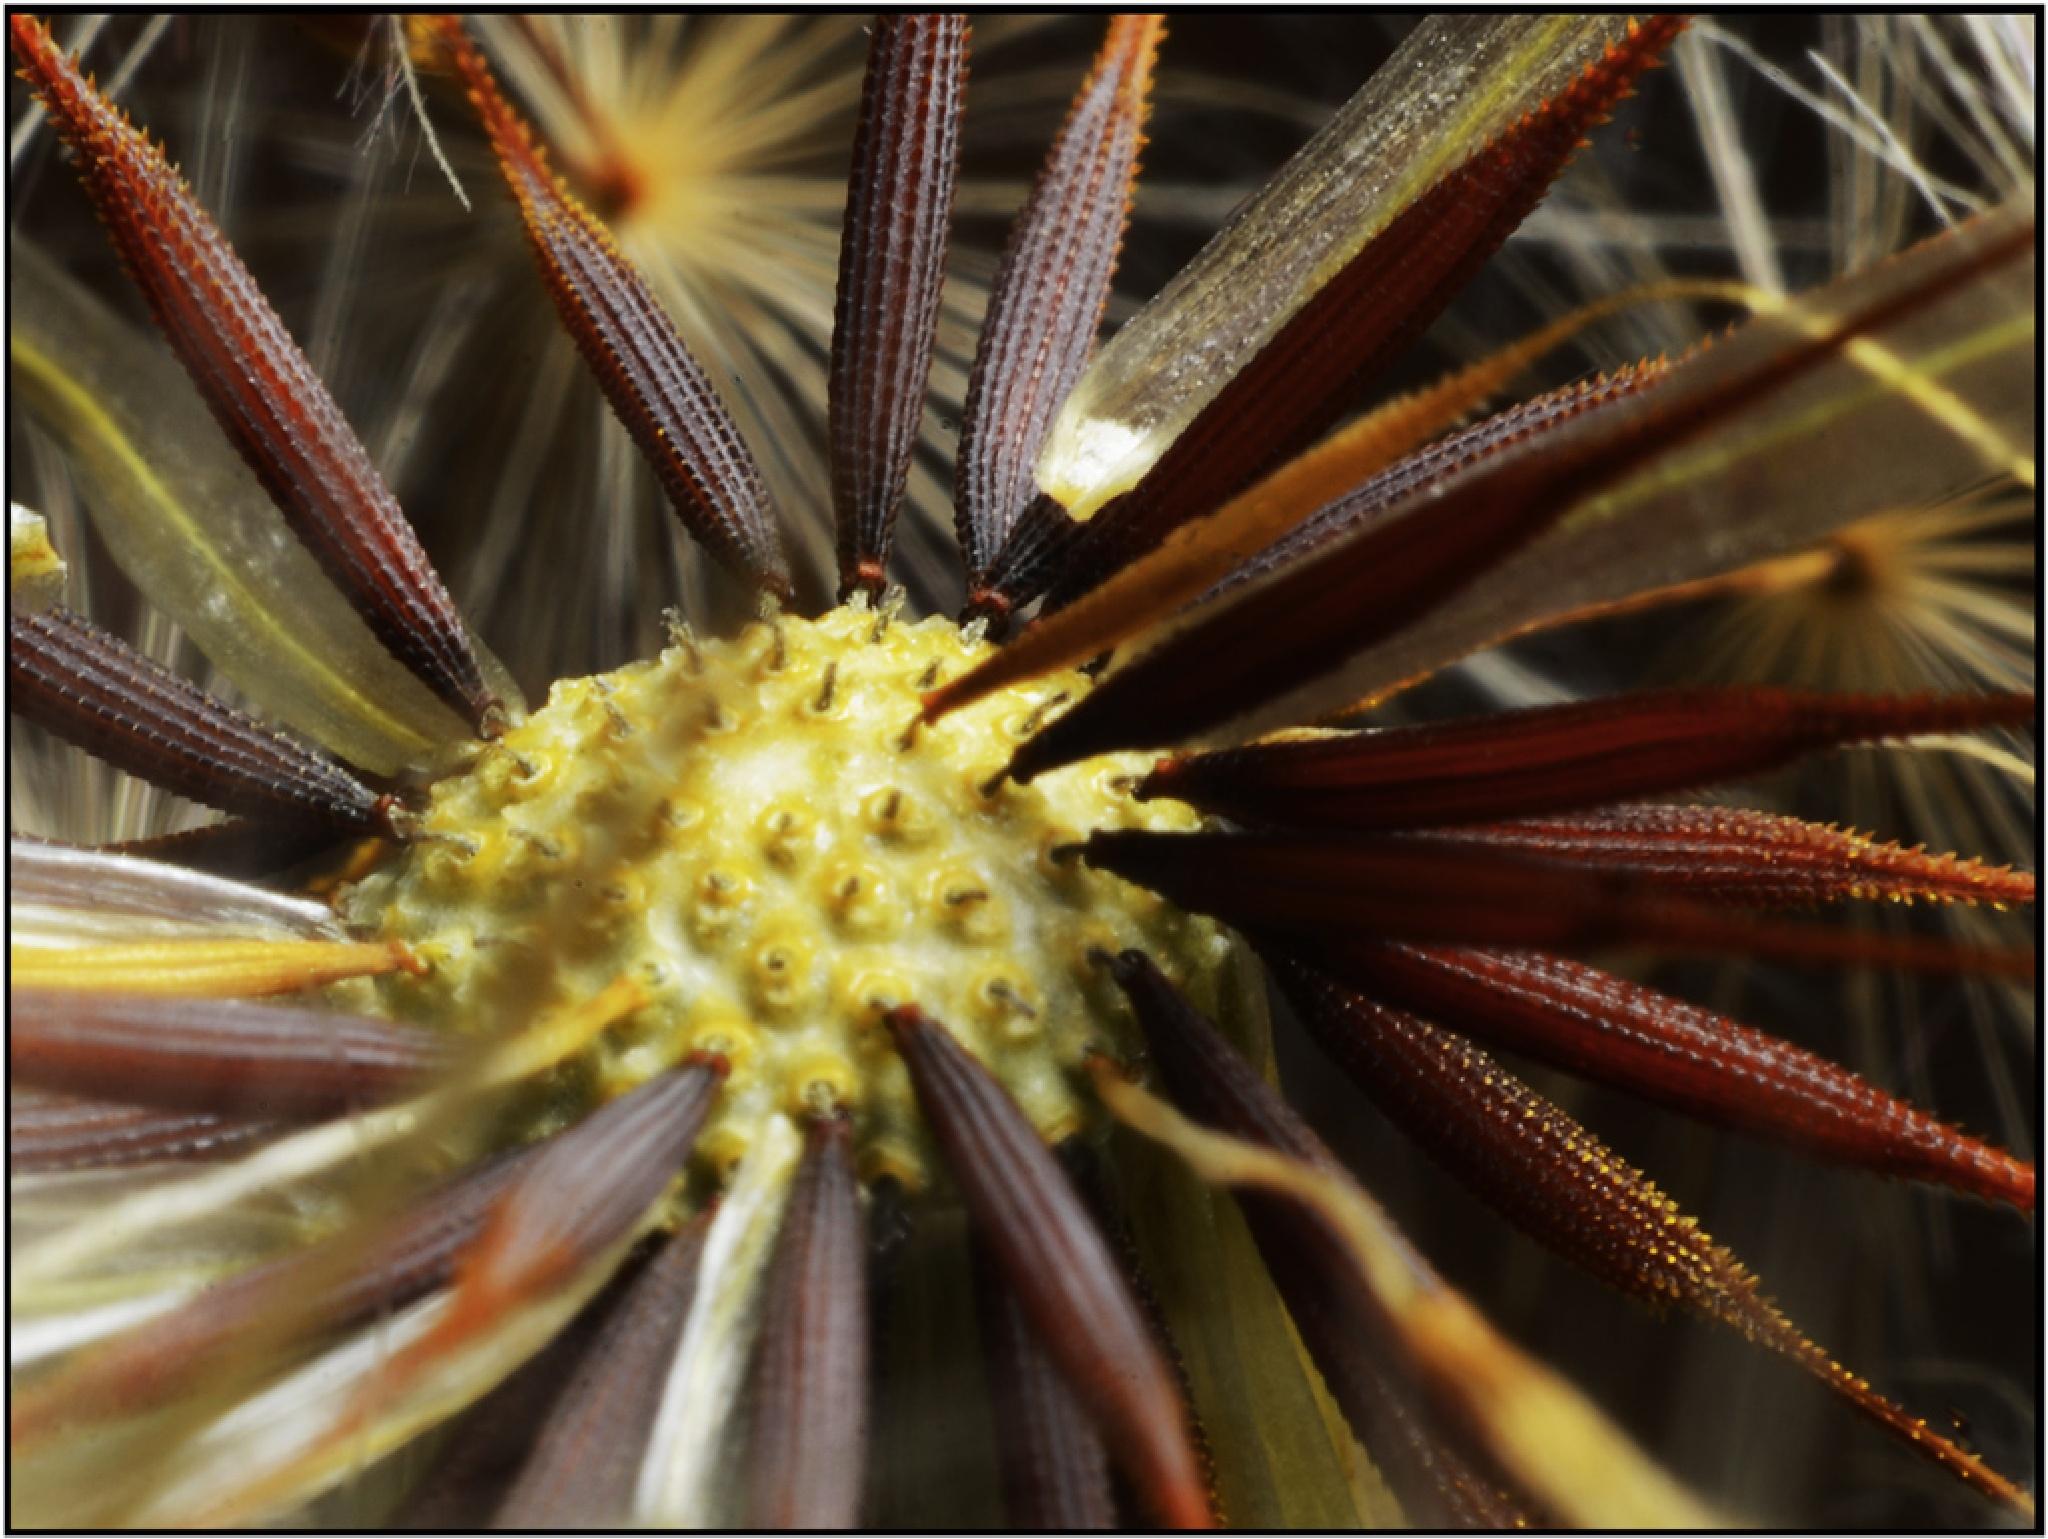 Seeds by Bertie Price